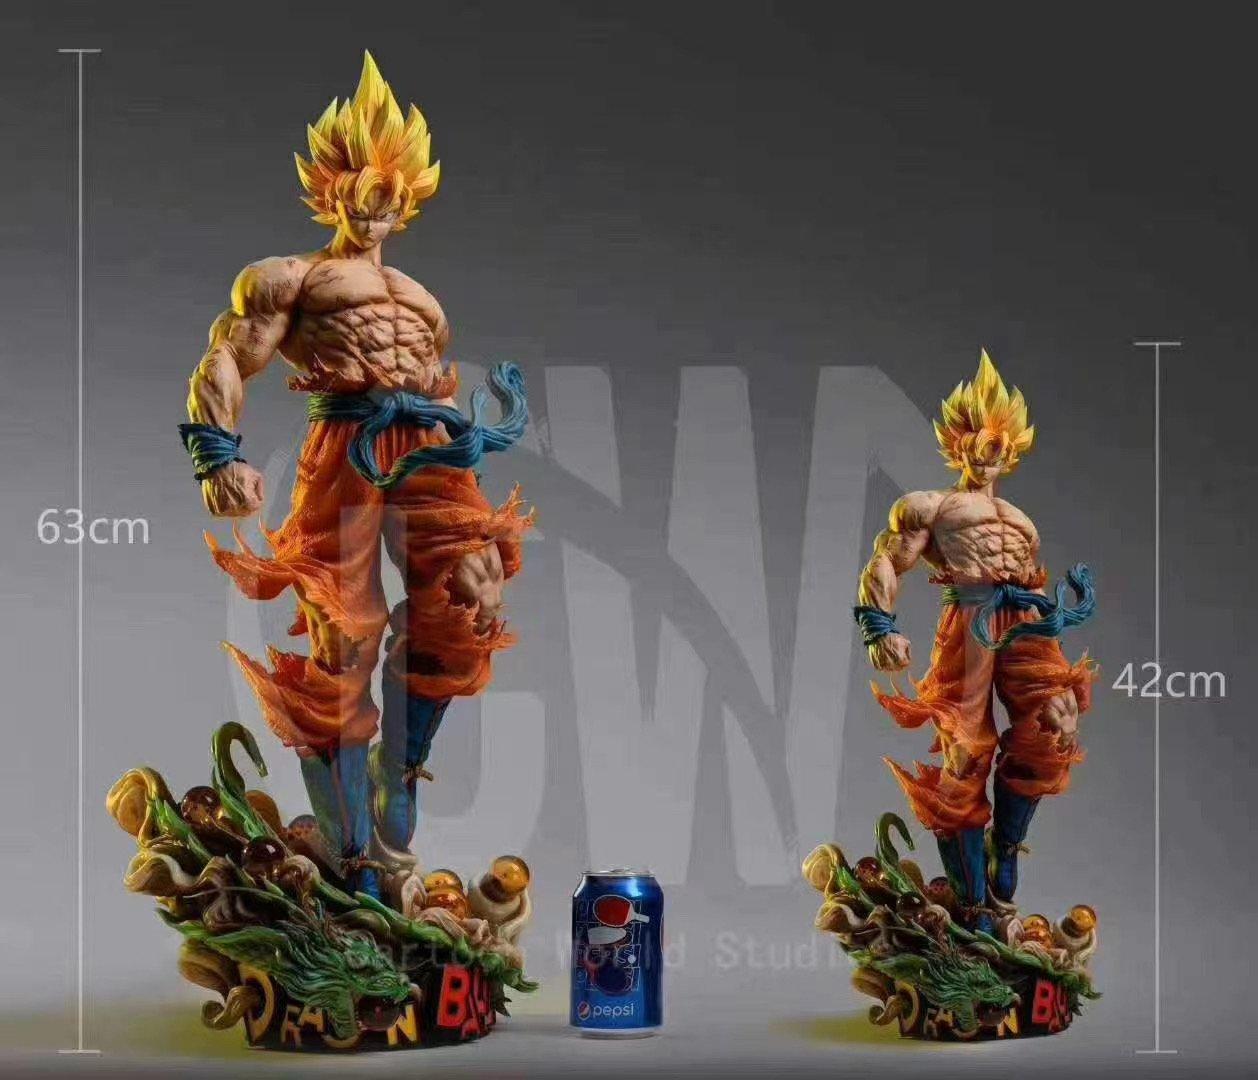 Image of [Pre-Order]Dragon Ball Z CW Studio Goku Resin Statue